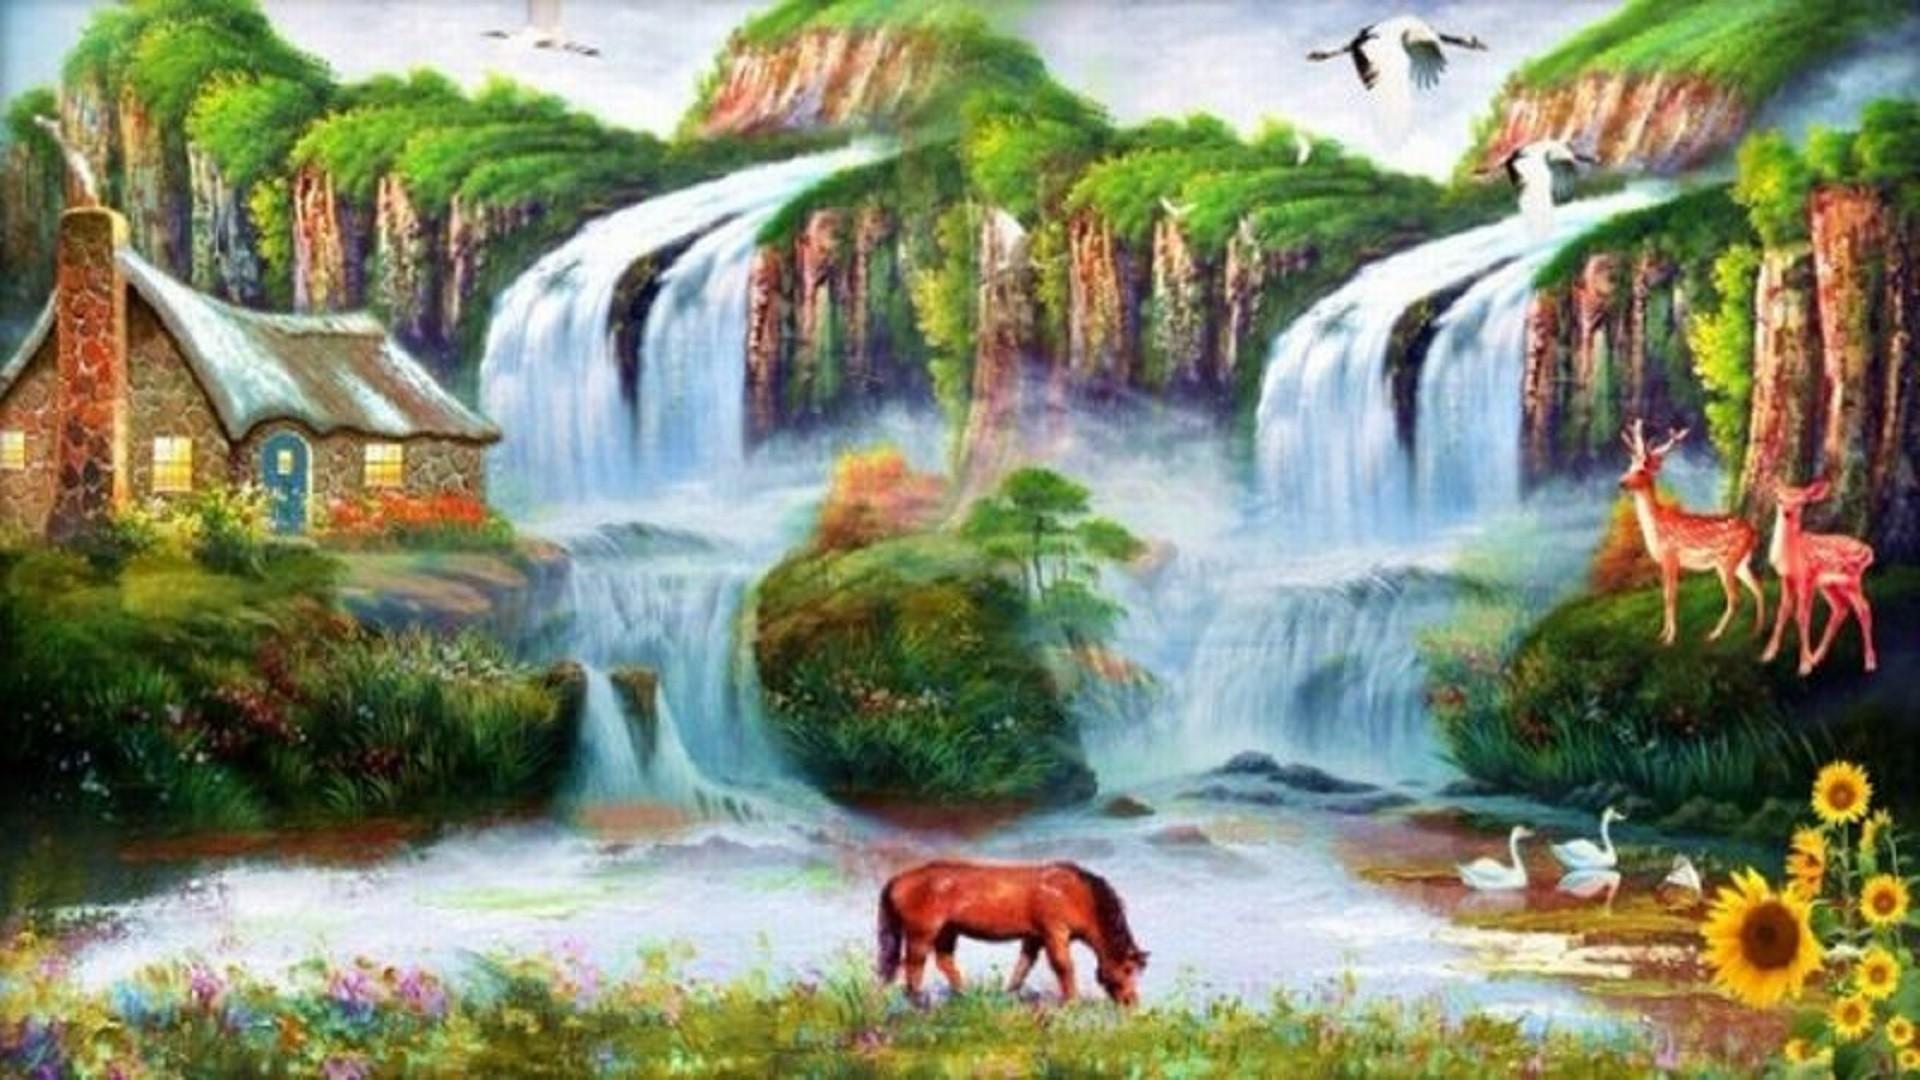 1920x1080 Waterfalls Forest Rocky Mountain Pool Falls Pond Green Wallpaper Scenery Waterfall Detail